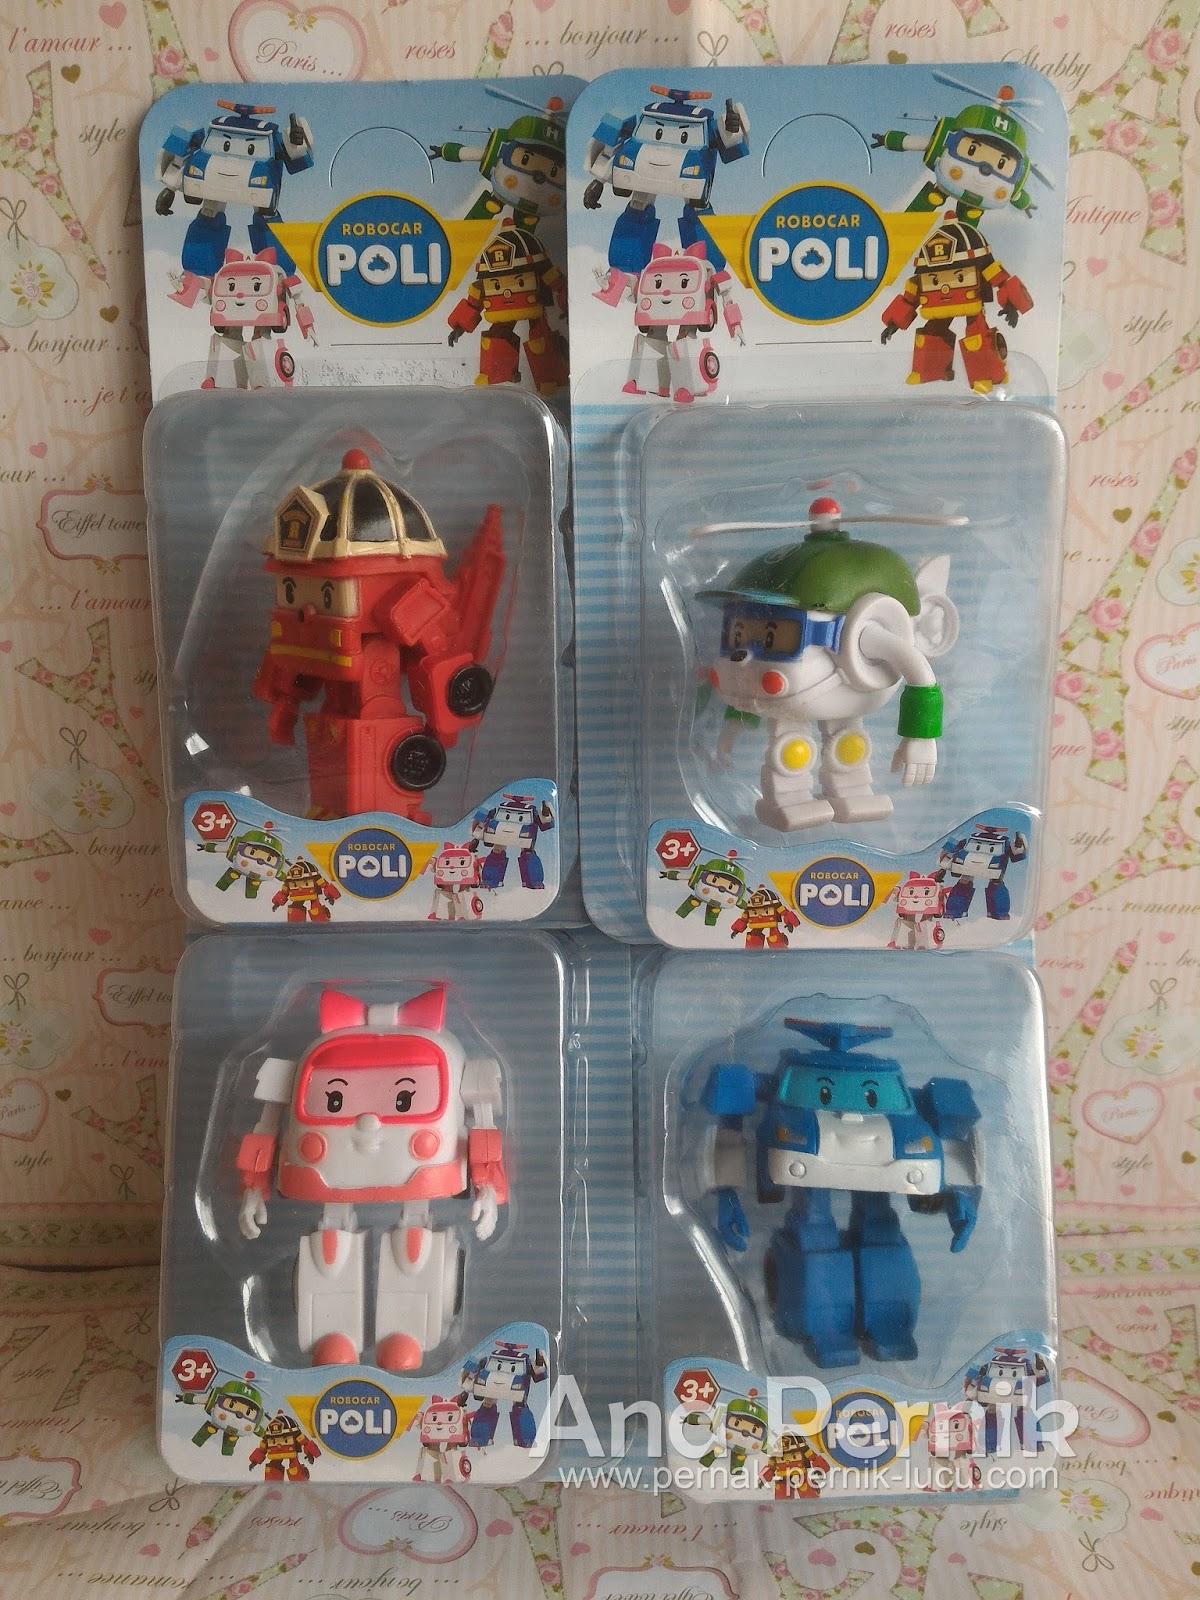 Robocar Poli; mainan; mainan mobil-mobilan; pernak pernik; mainan anak; mainan robot-robotan; robo poli